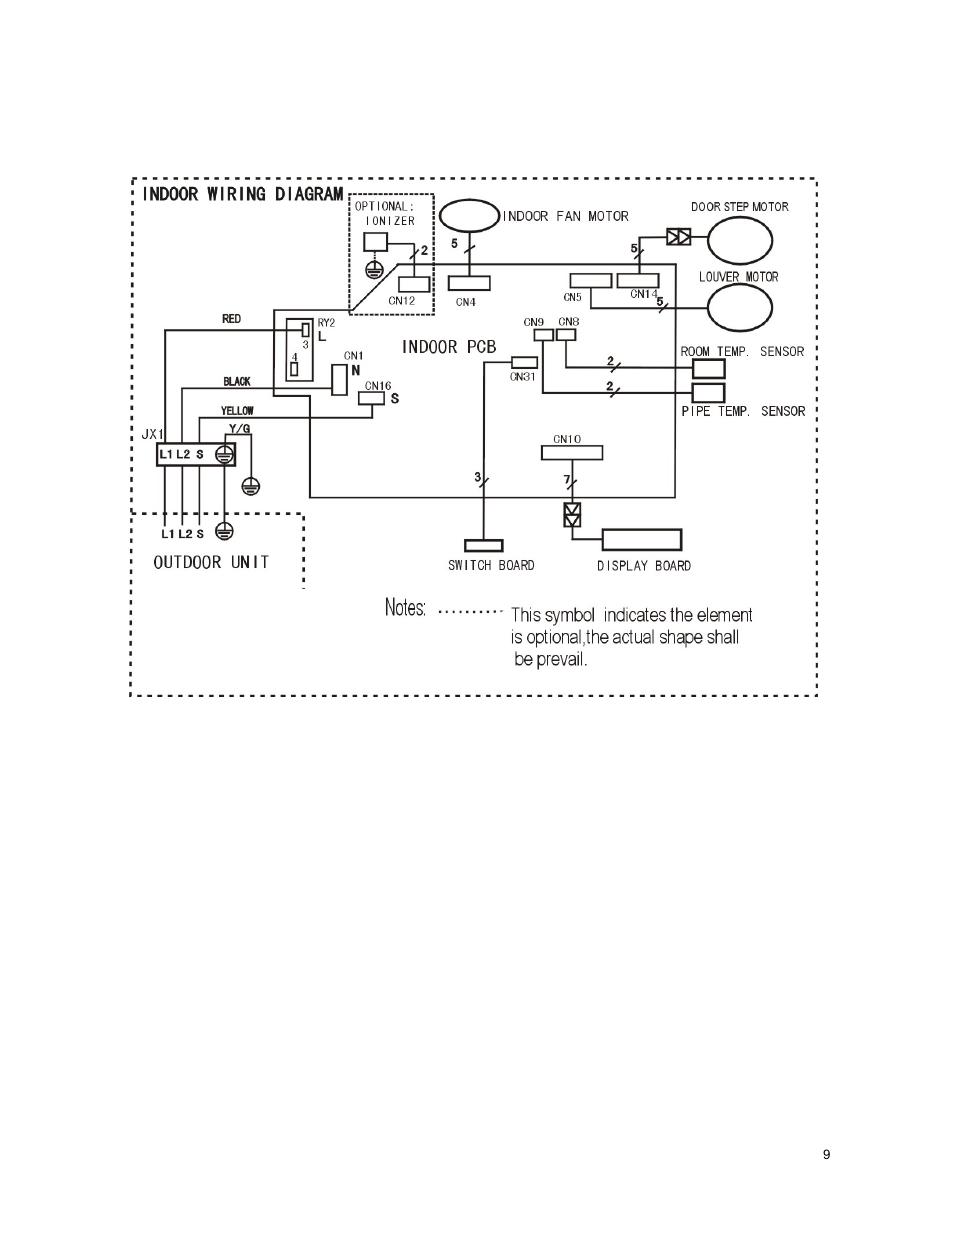 Klimaire Wiring Diagram Free For You 2970 Volkswagen 1 Indoor Unit Ksim Series Service Manual Rh Manualsdir Com Installation